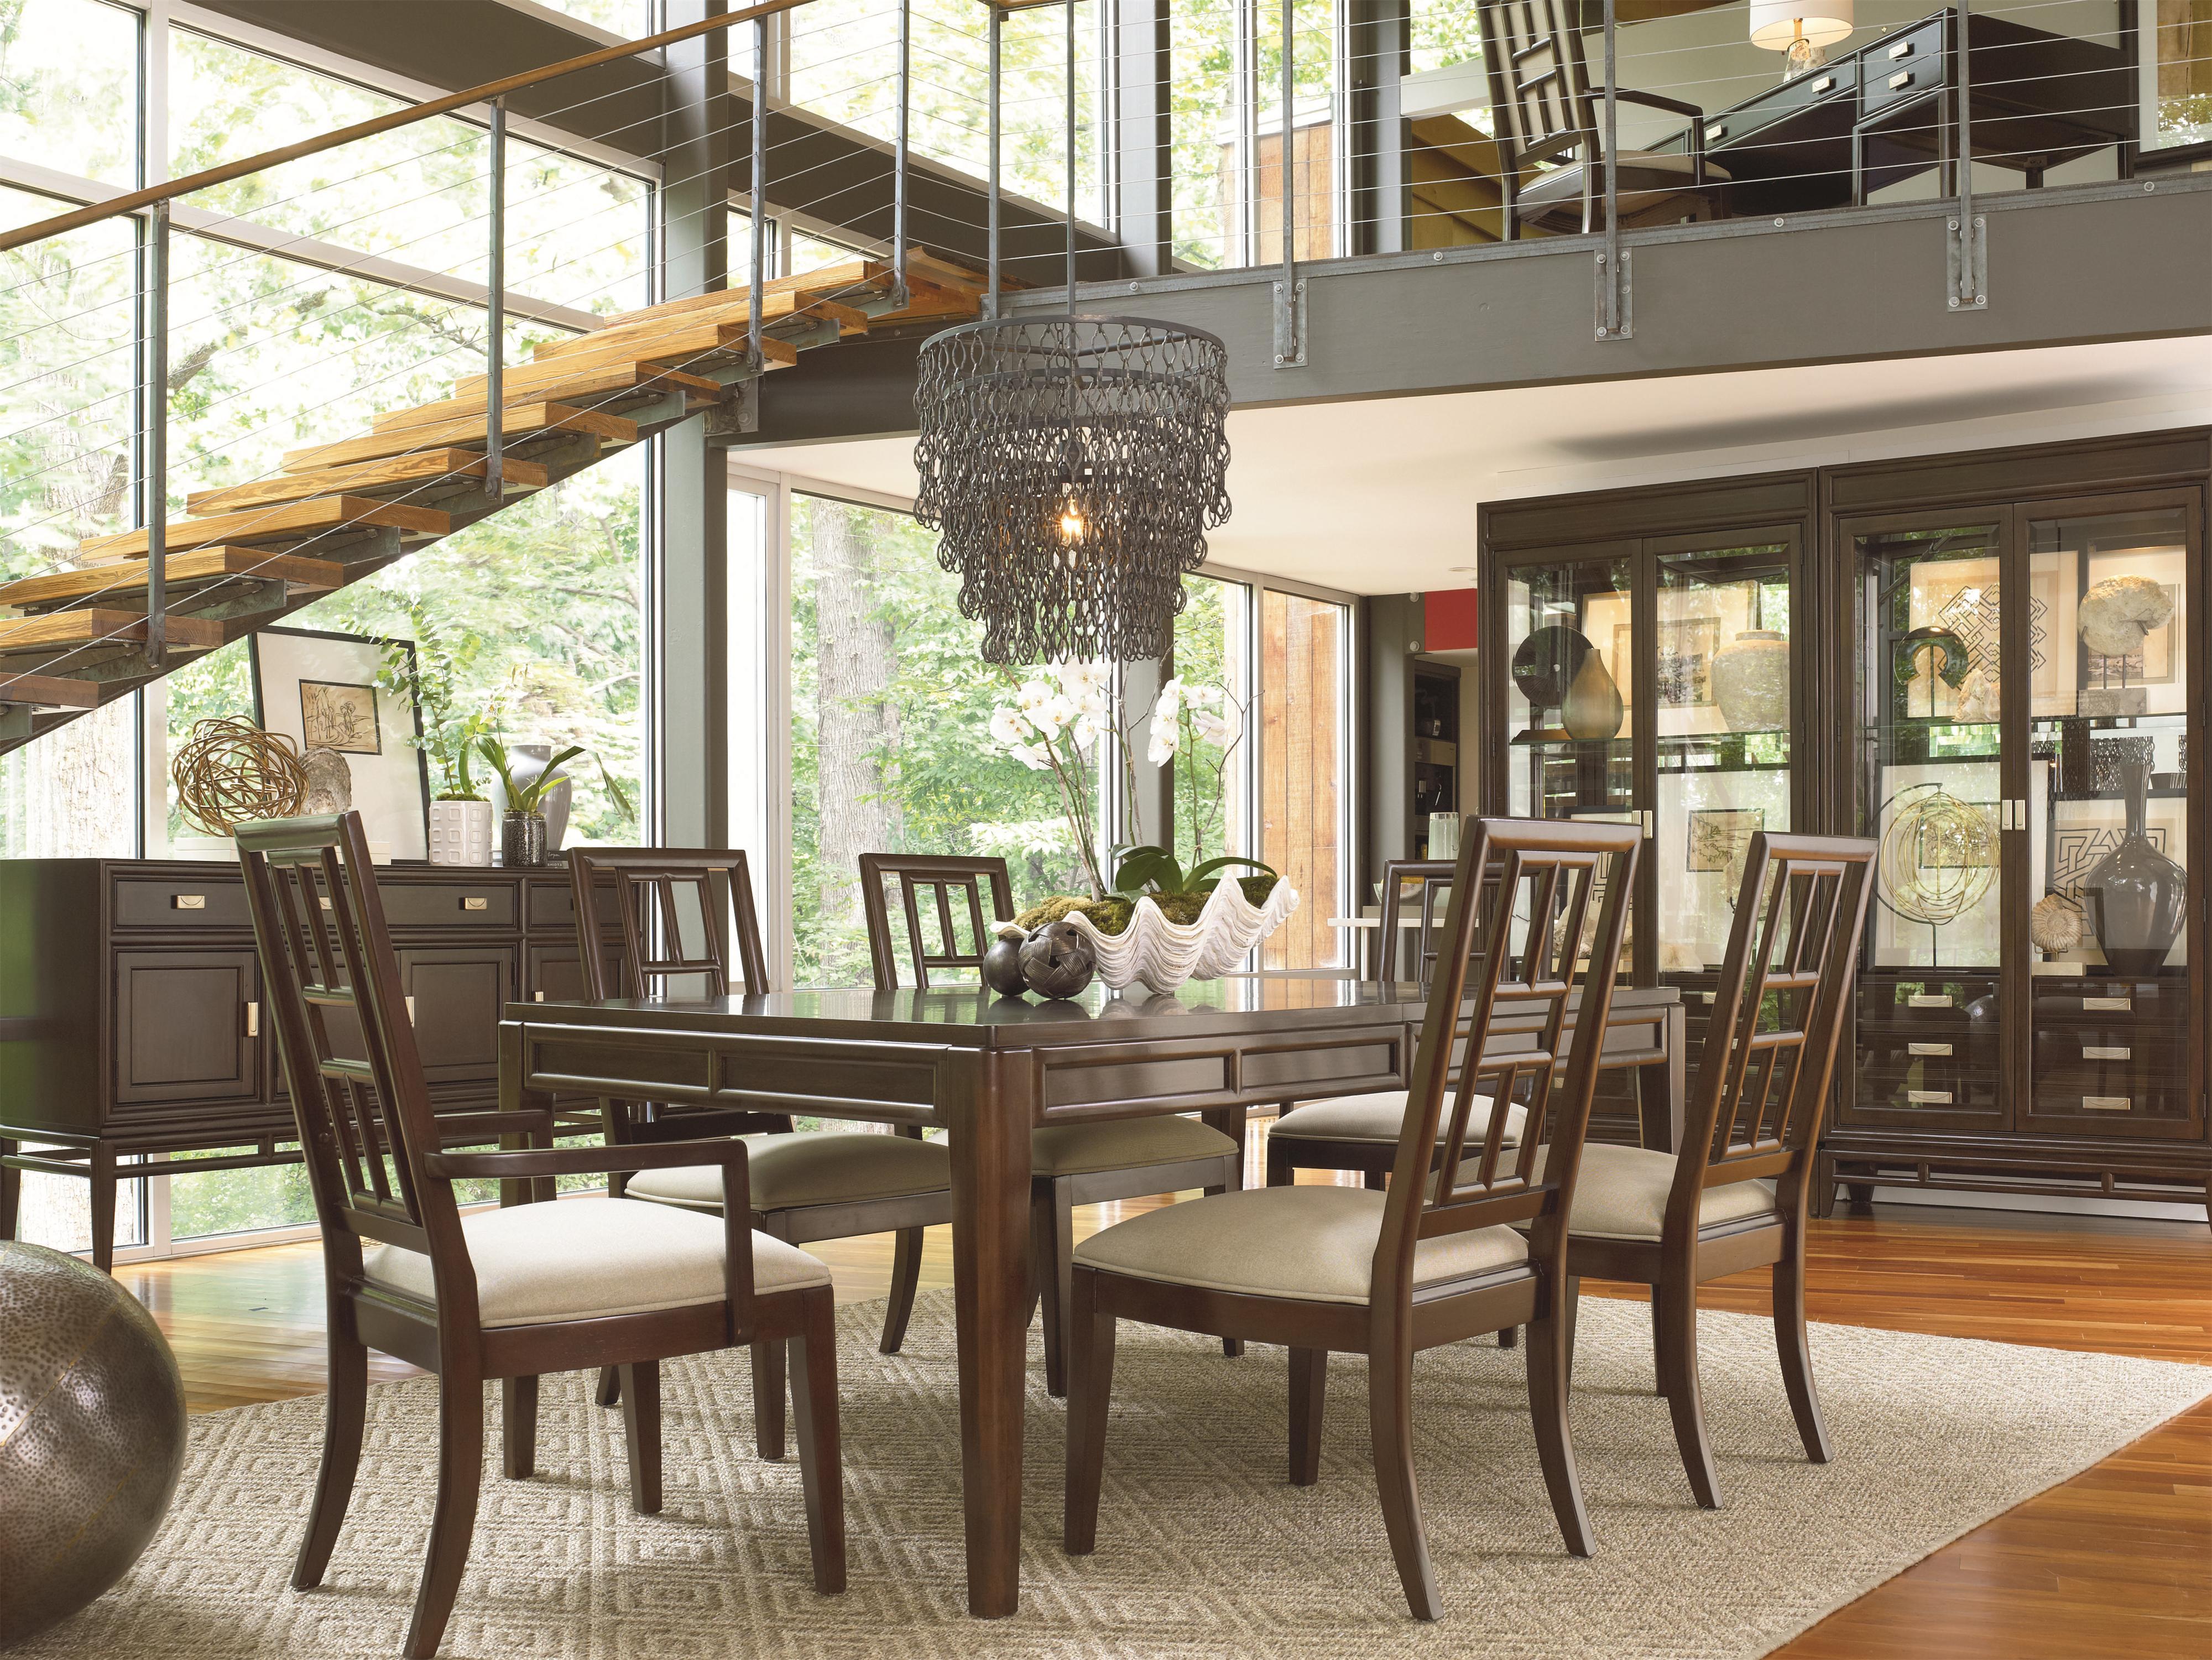 Thomasville Furniture Dining Room Lantau 826 By Thomasvillear Baer39s Furniture Thomasville